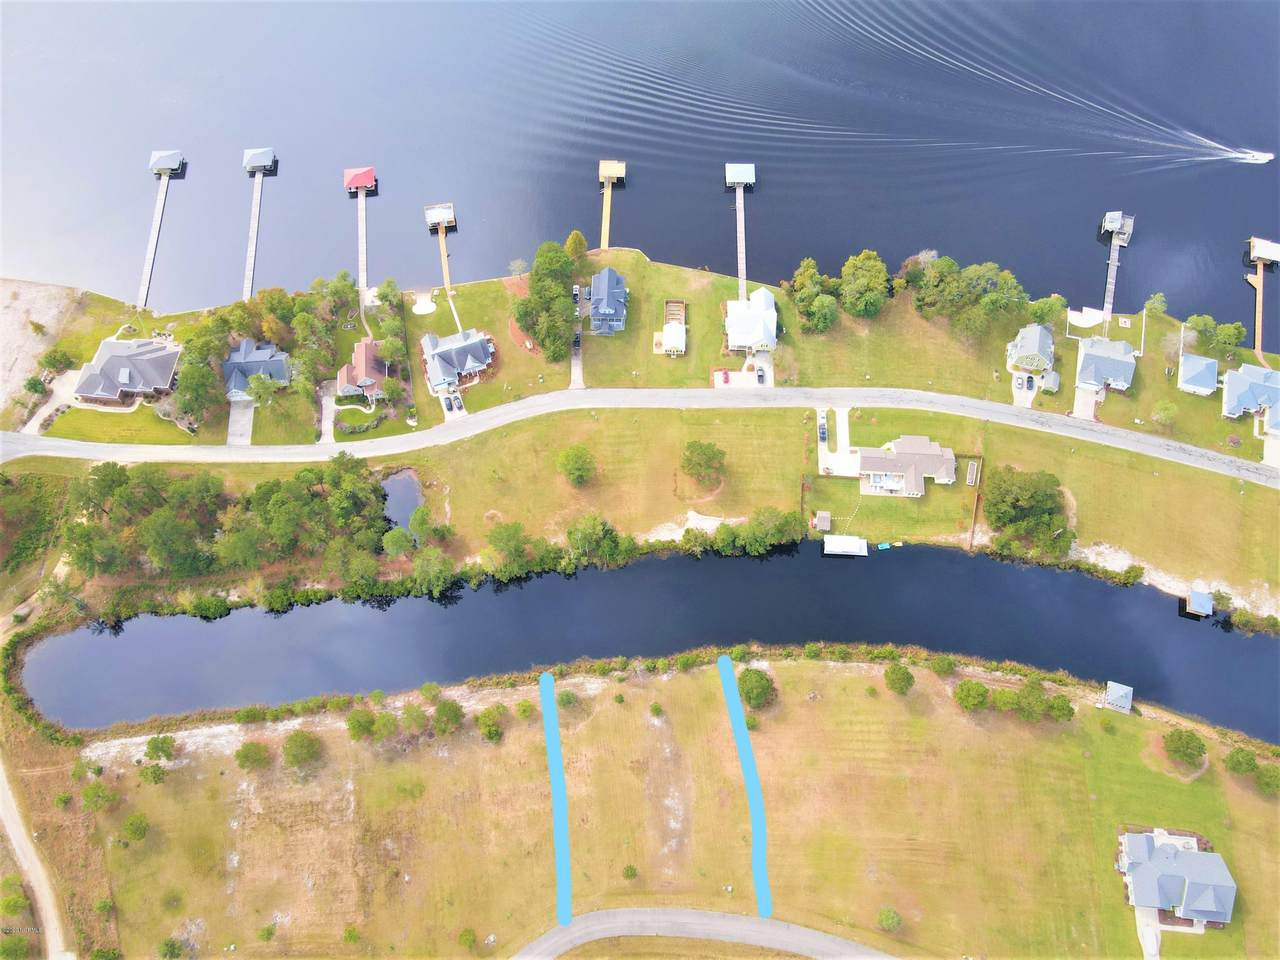 931 East Island Way - Photo 1